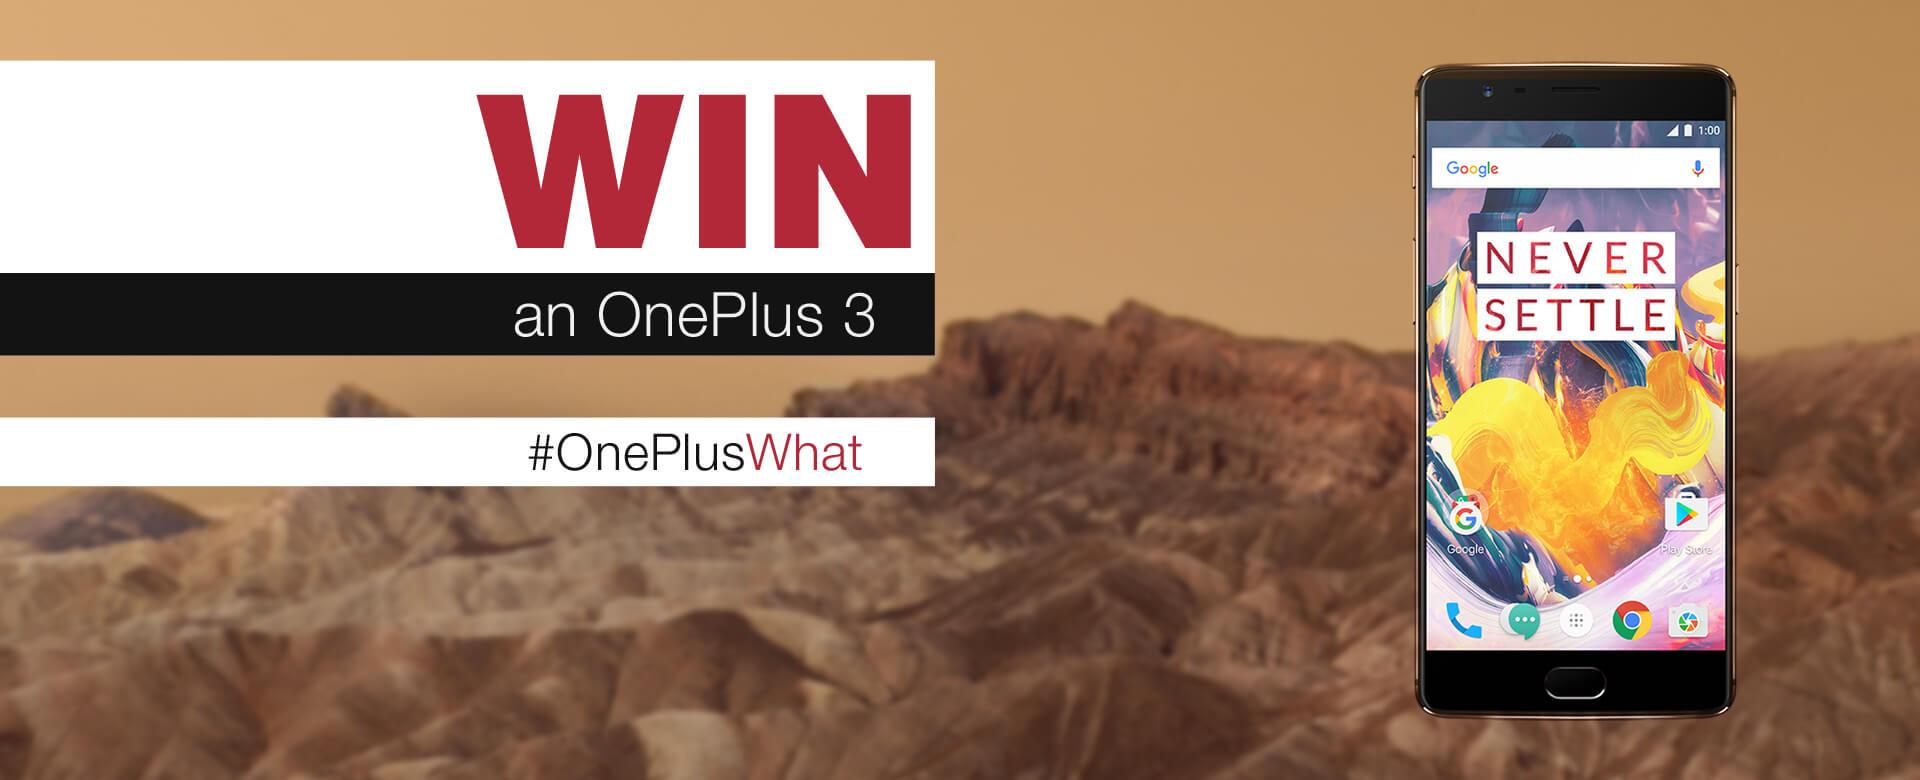 Win an OnePlus 3